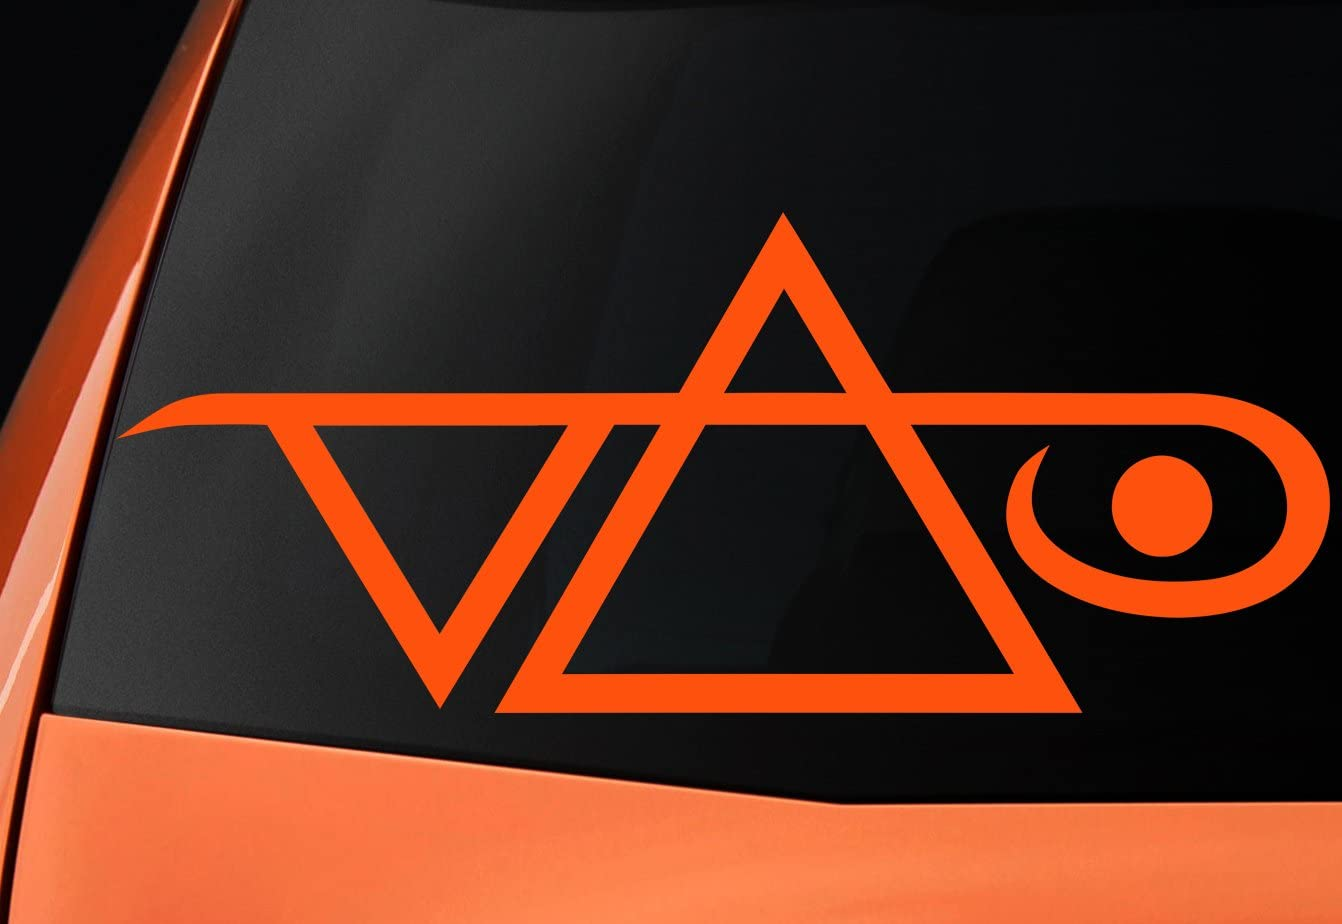 Steve Vai Logo – vinilo para coches, ventanas, paredes, portátiles ...